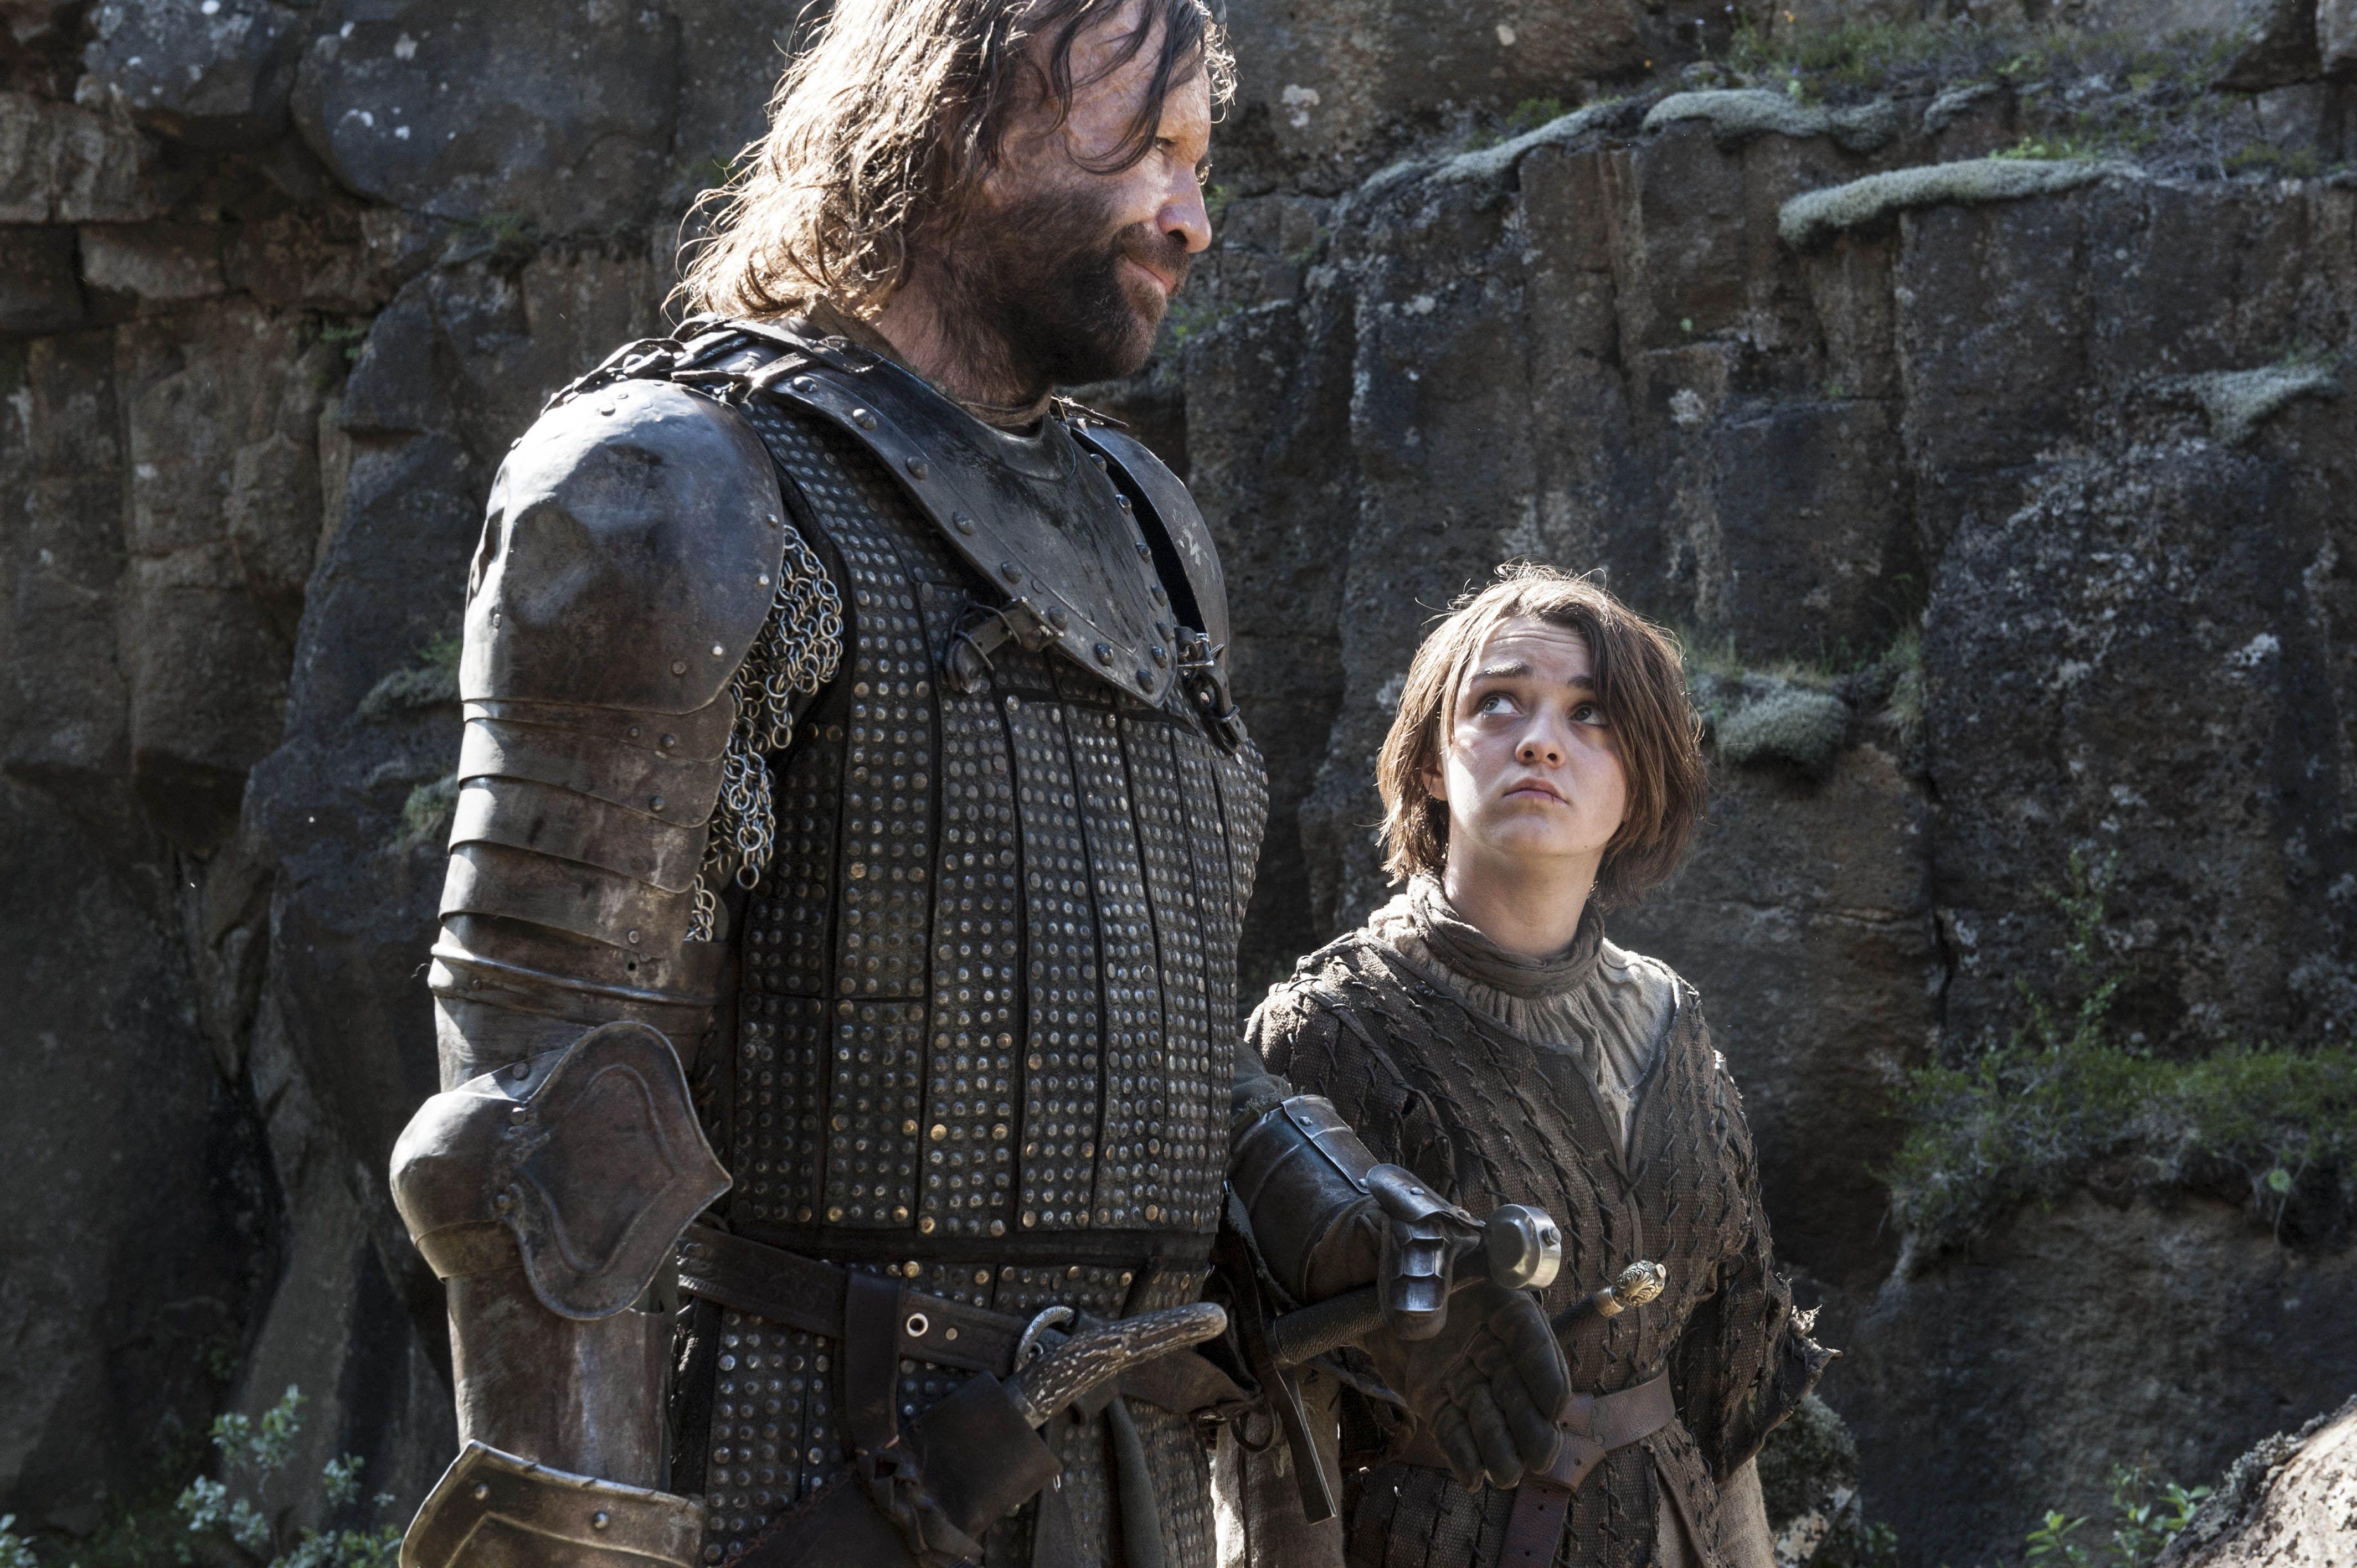 Game Of Thrones Season 4 Episode 8 Still Game Of Thrones Facts Got Memes Game Of Thrones Episodes